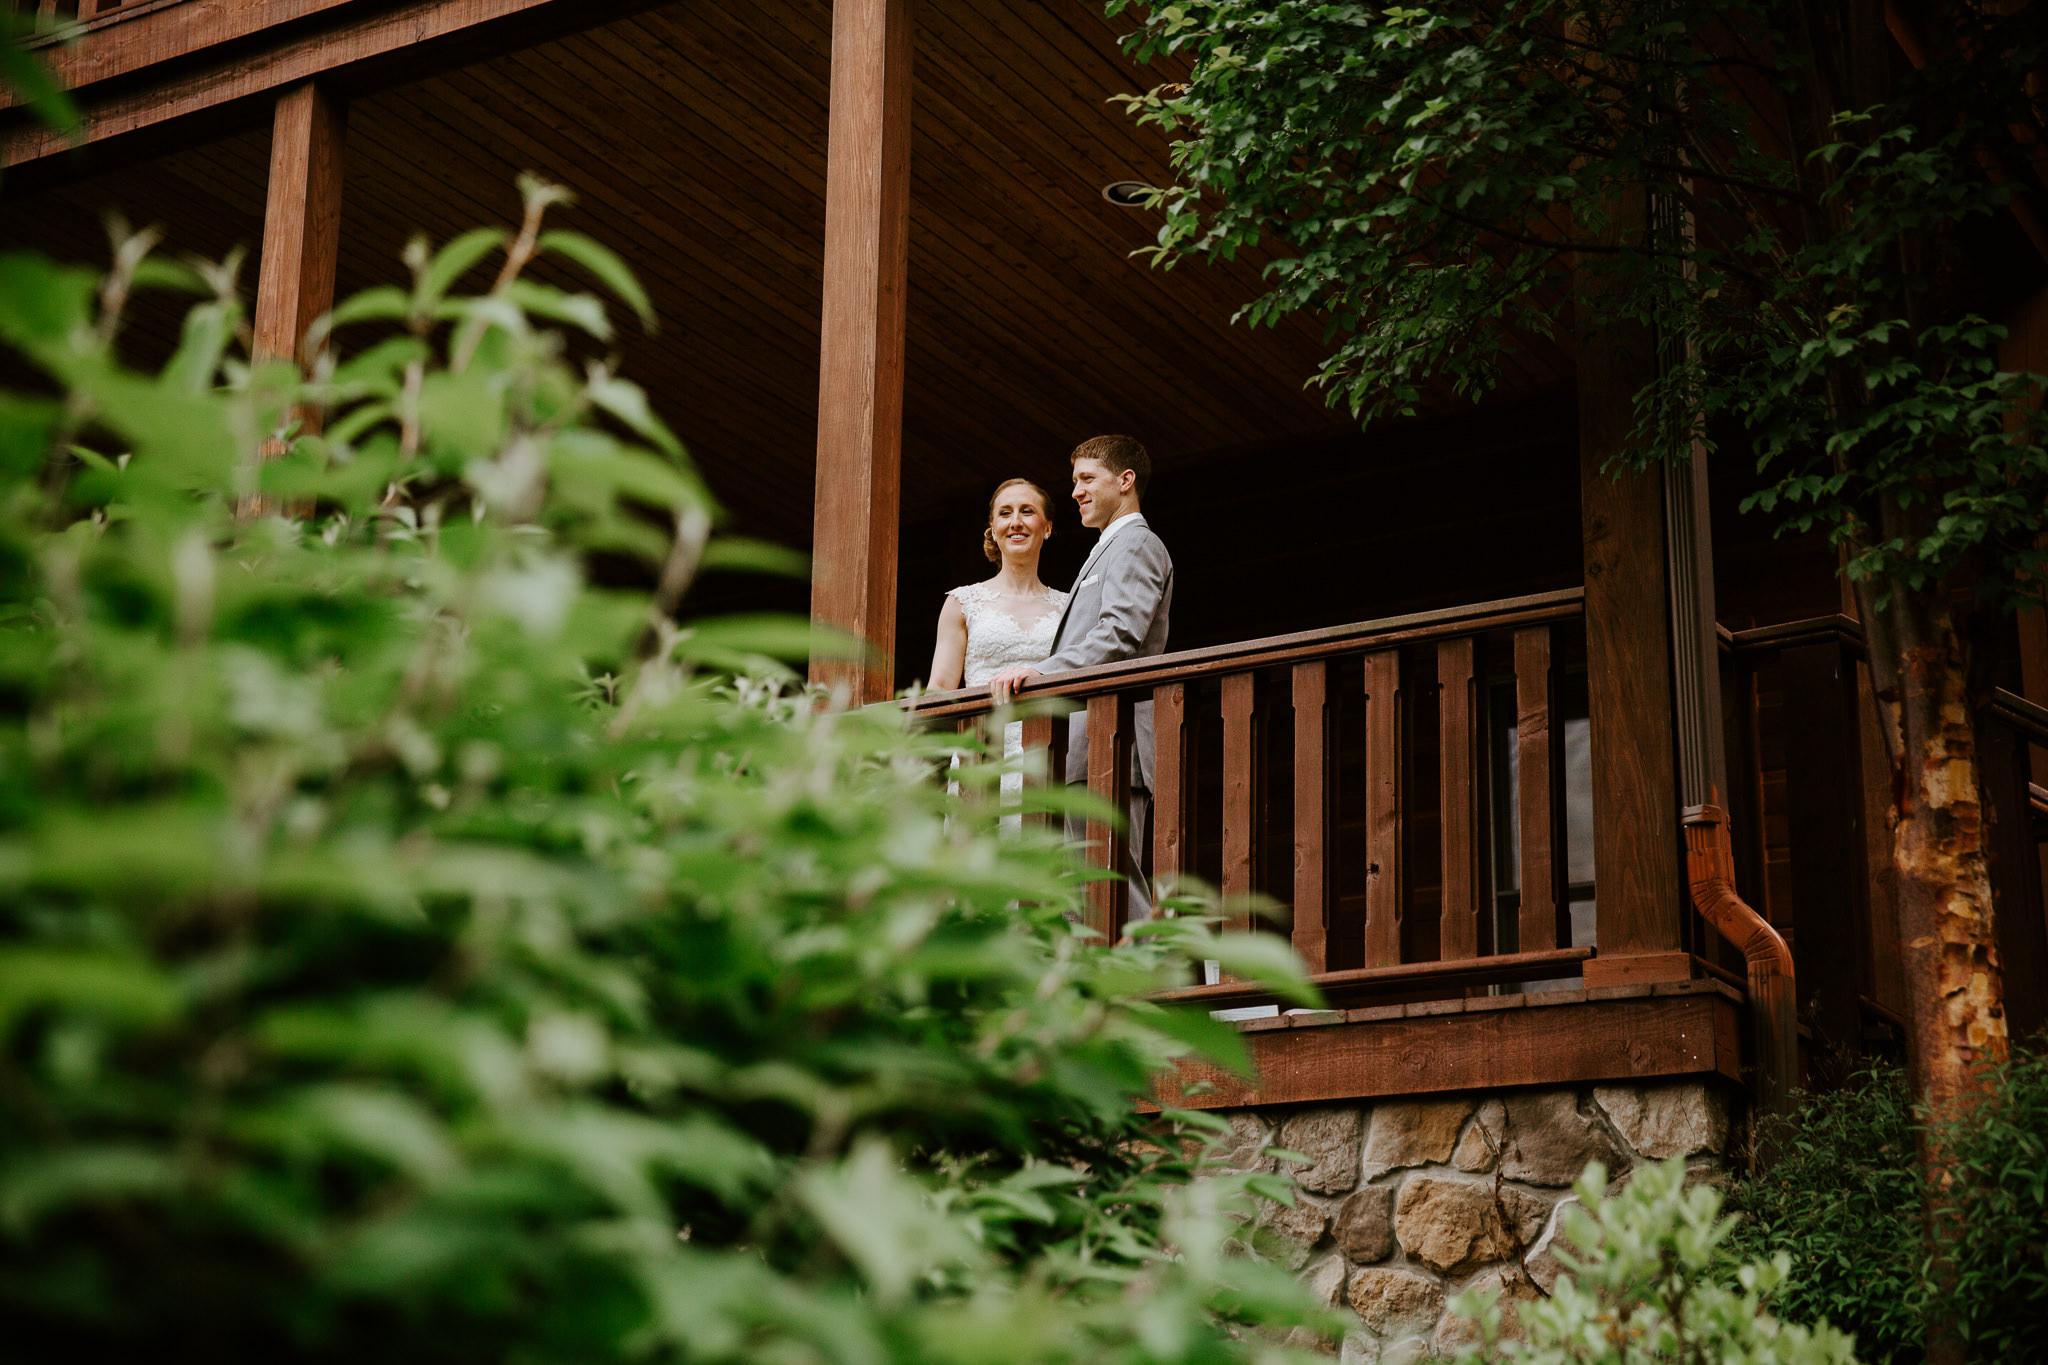 House Mountain Inn - Weddings - Lexington - Virginia - Best Wedding Photographer - Pat Cori Photography-29.jpg